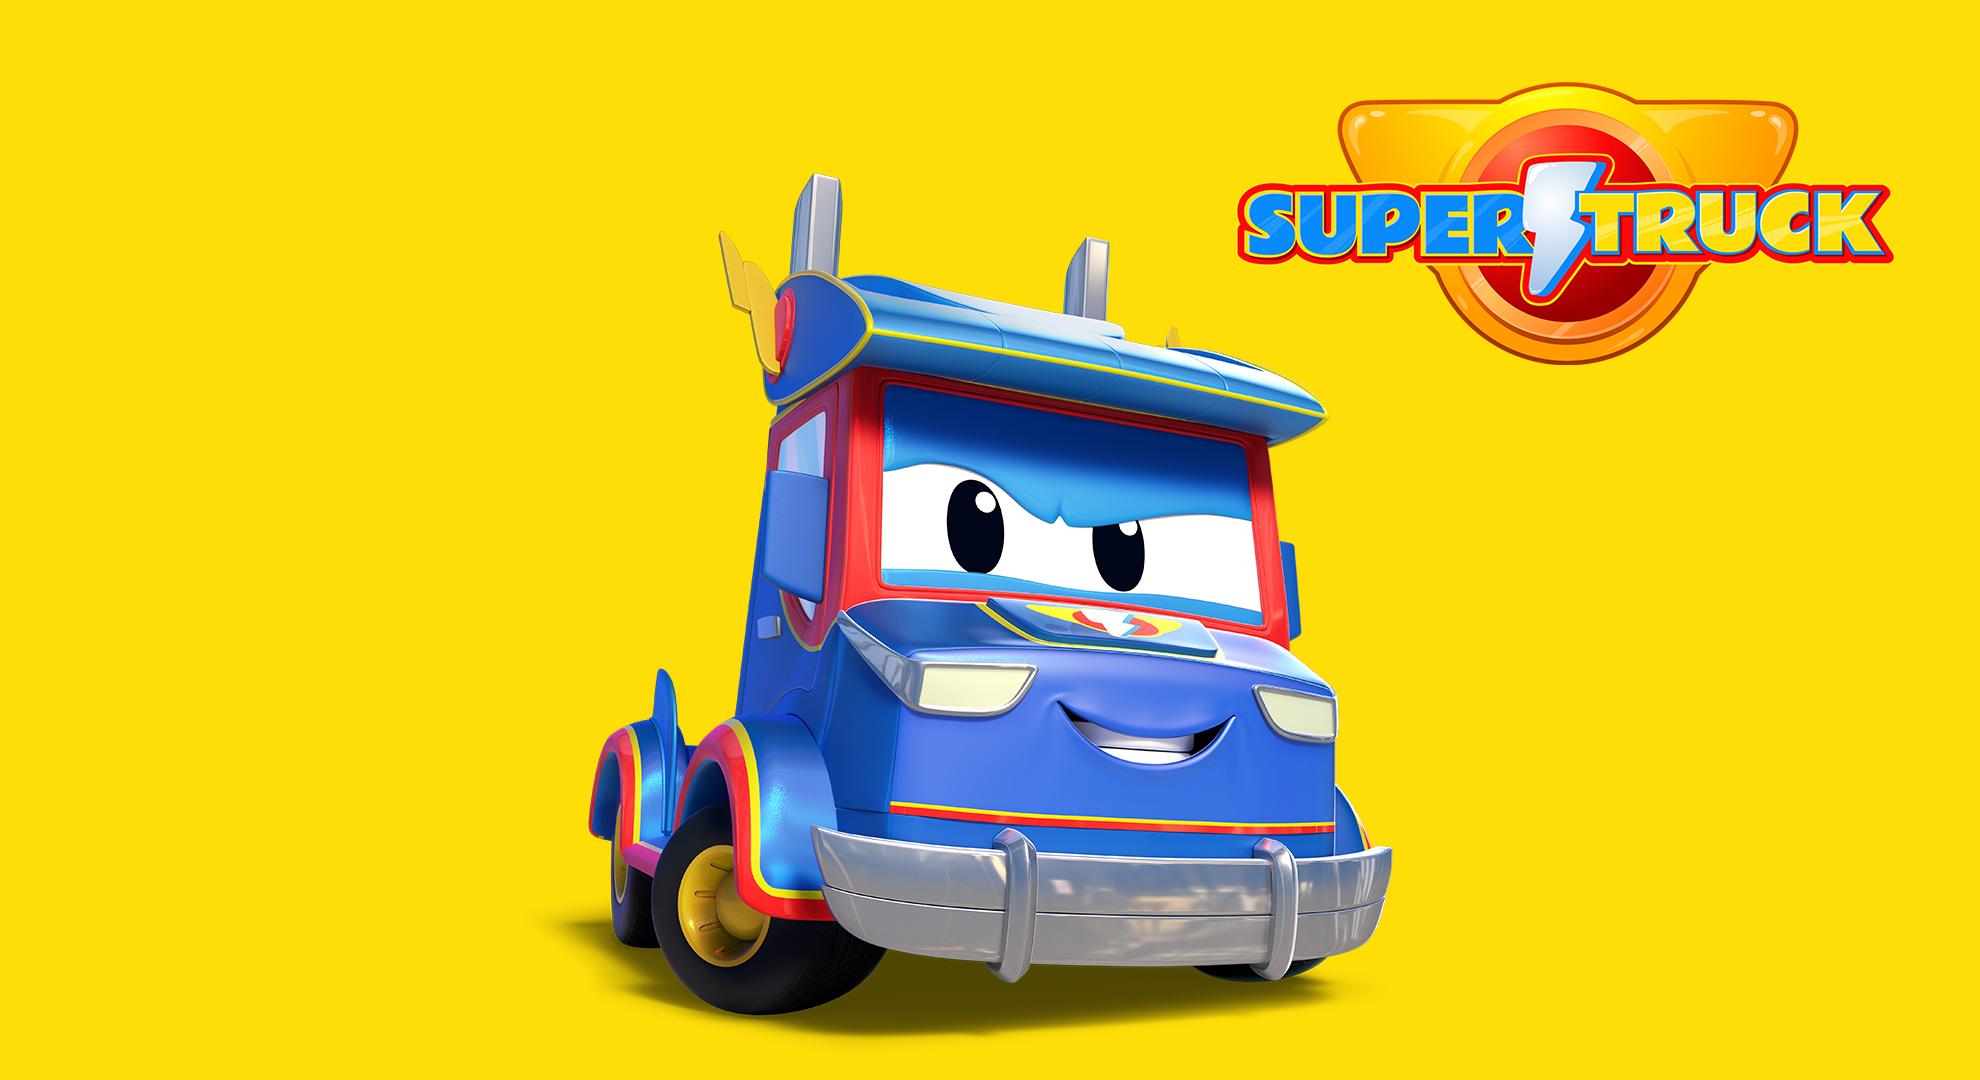 Super Truck - Carl the Transformer on Amazon Prime Video UK